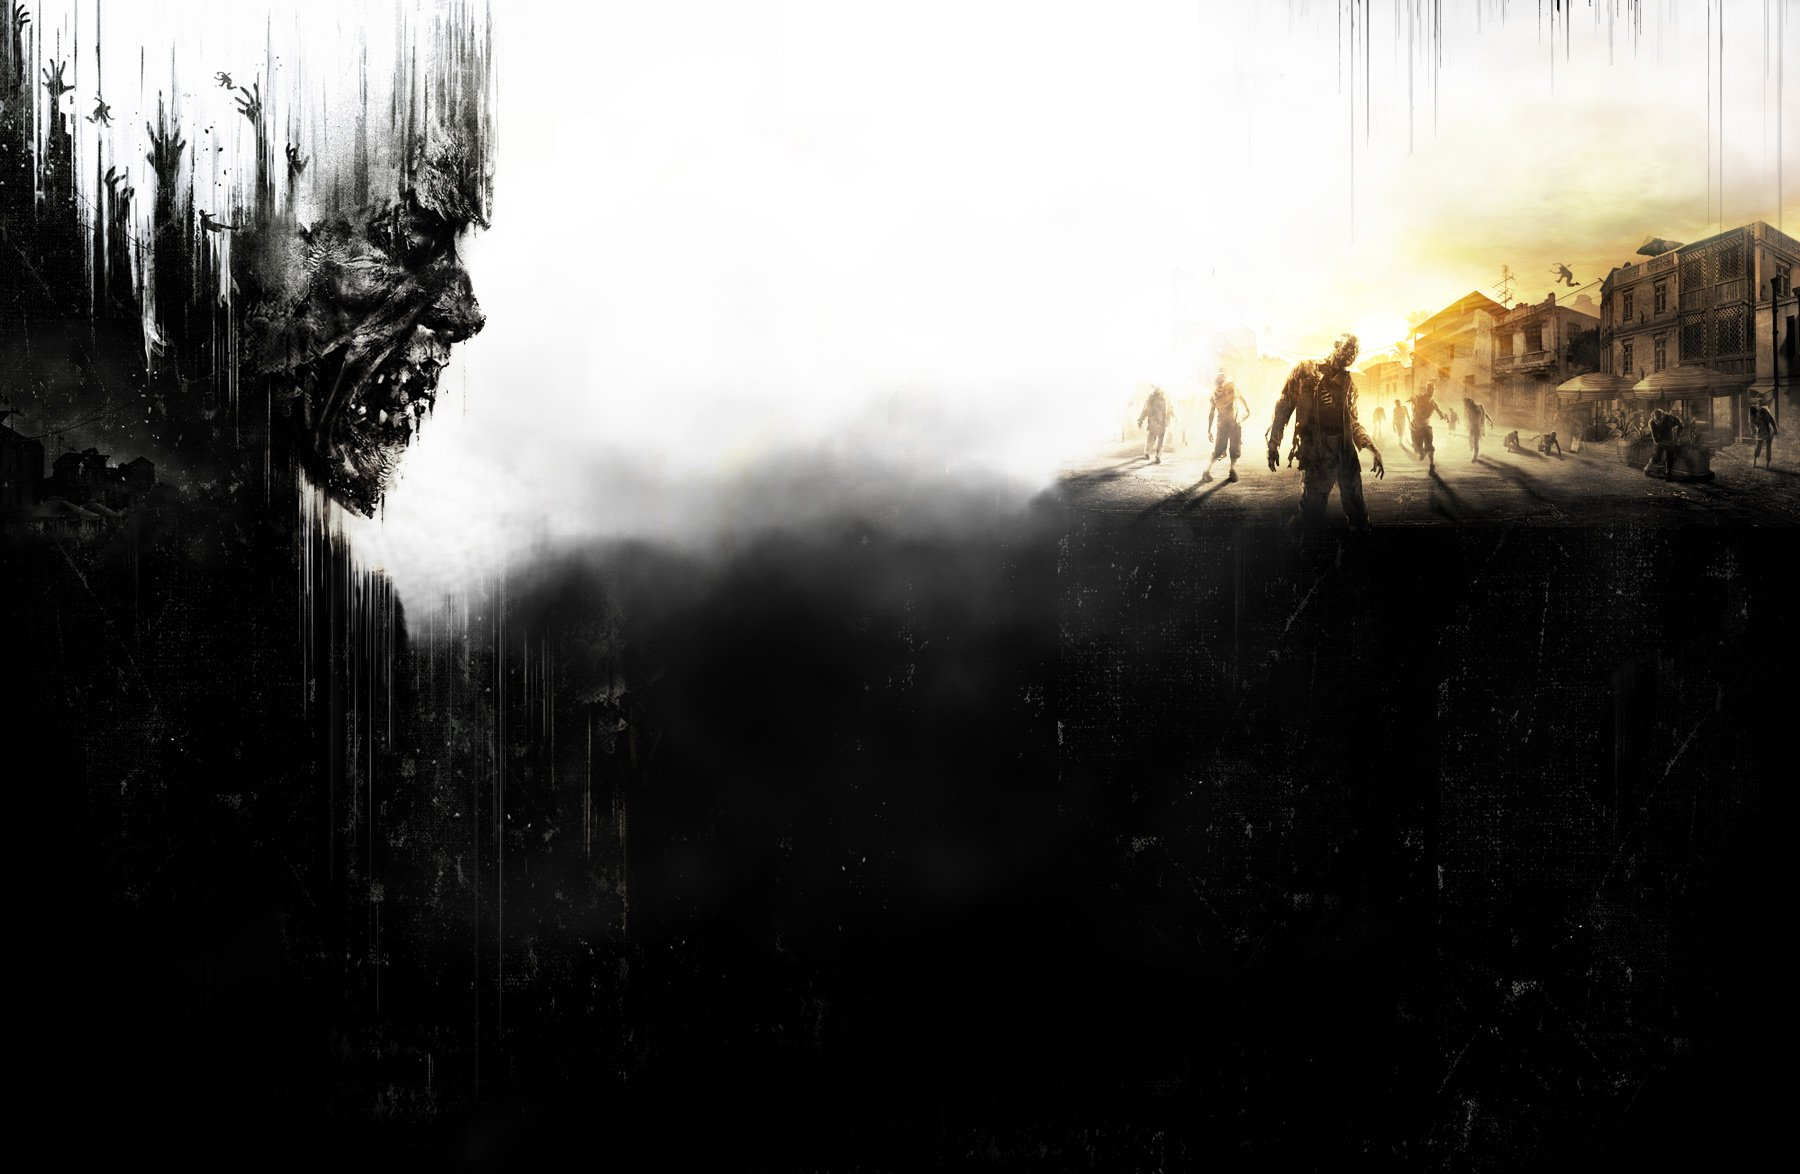 Dying Light dark zombie 4 wallpaper 1800x1174 166914 WallpaperUP 1800x1174